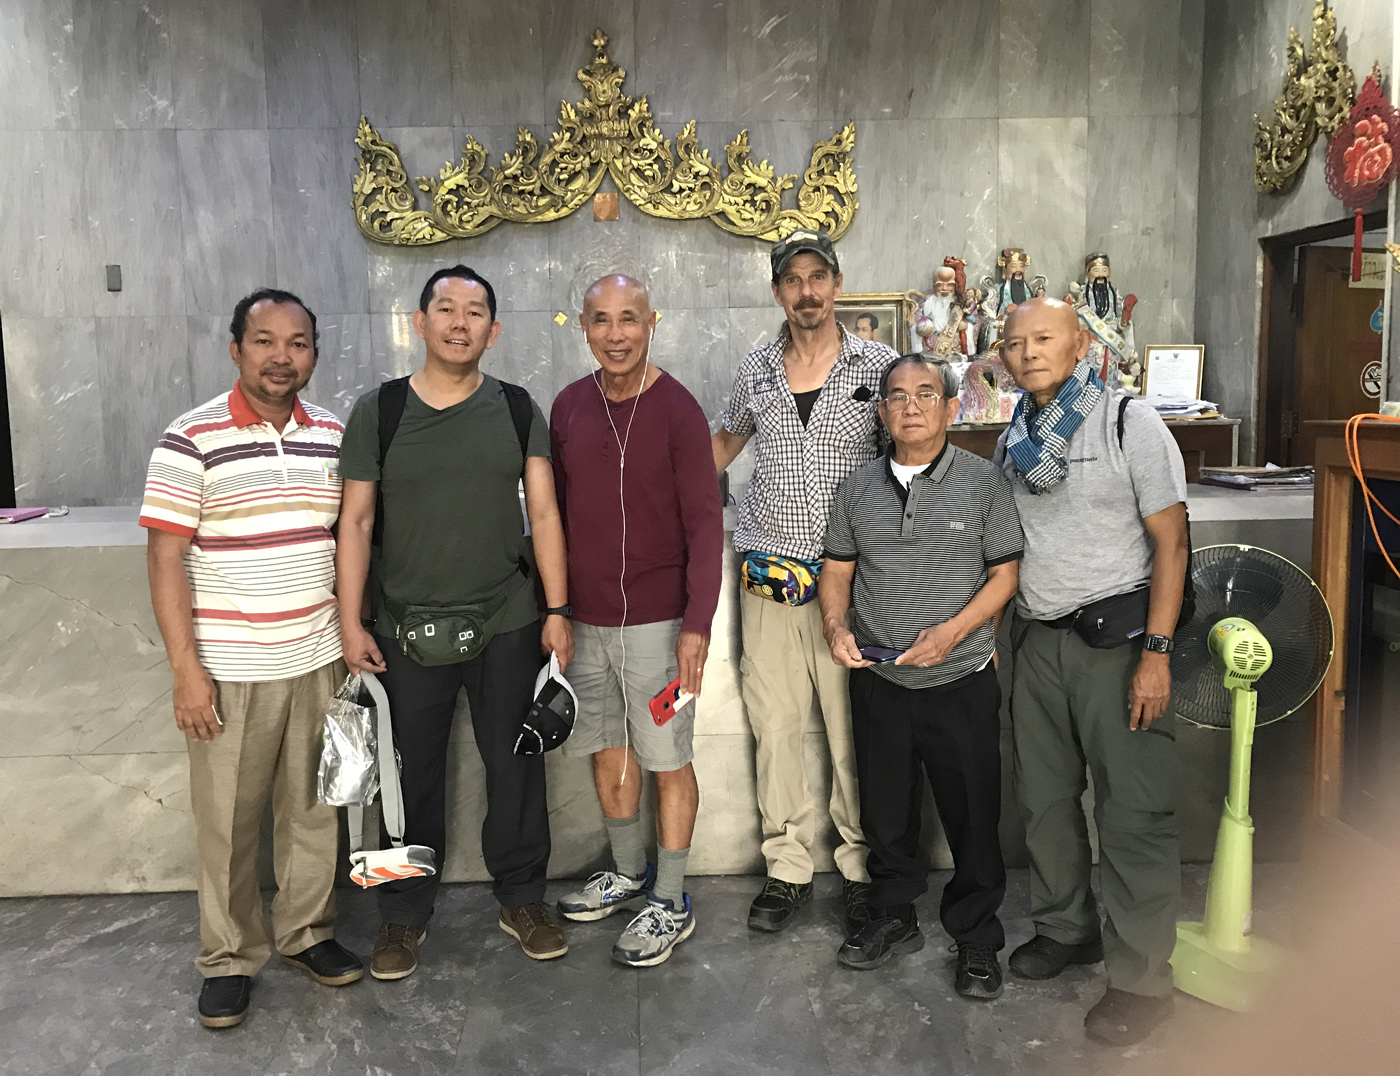 CNRP supporters in Bangkok on 12 November 2019. From left, Khin Chumroeun, Daley Uy, Hay Kimsan, Daniel Capka, Kirishima Taro and Sam Var.